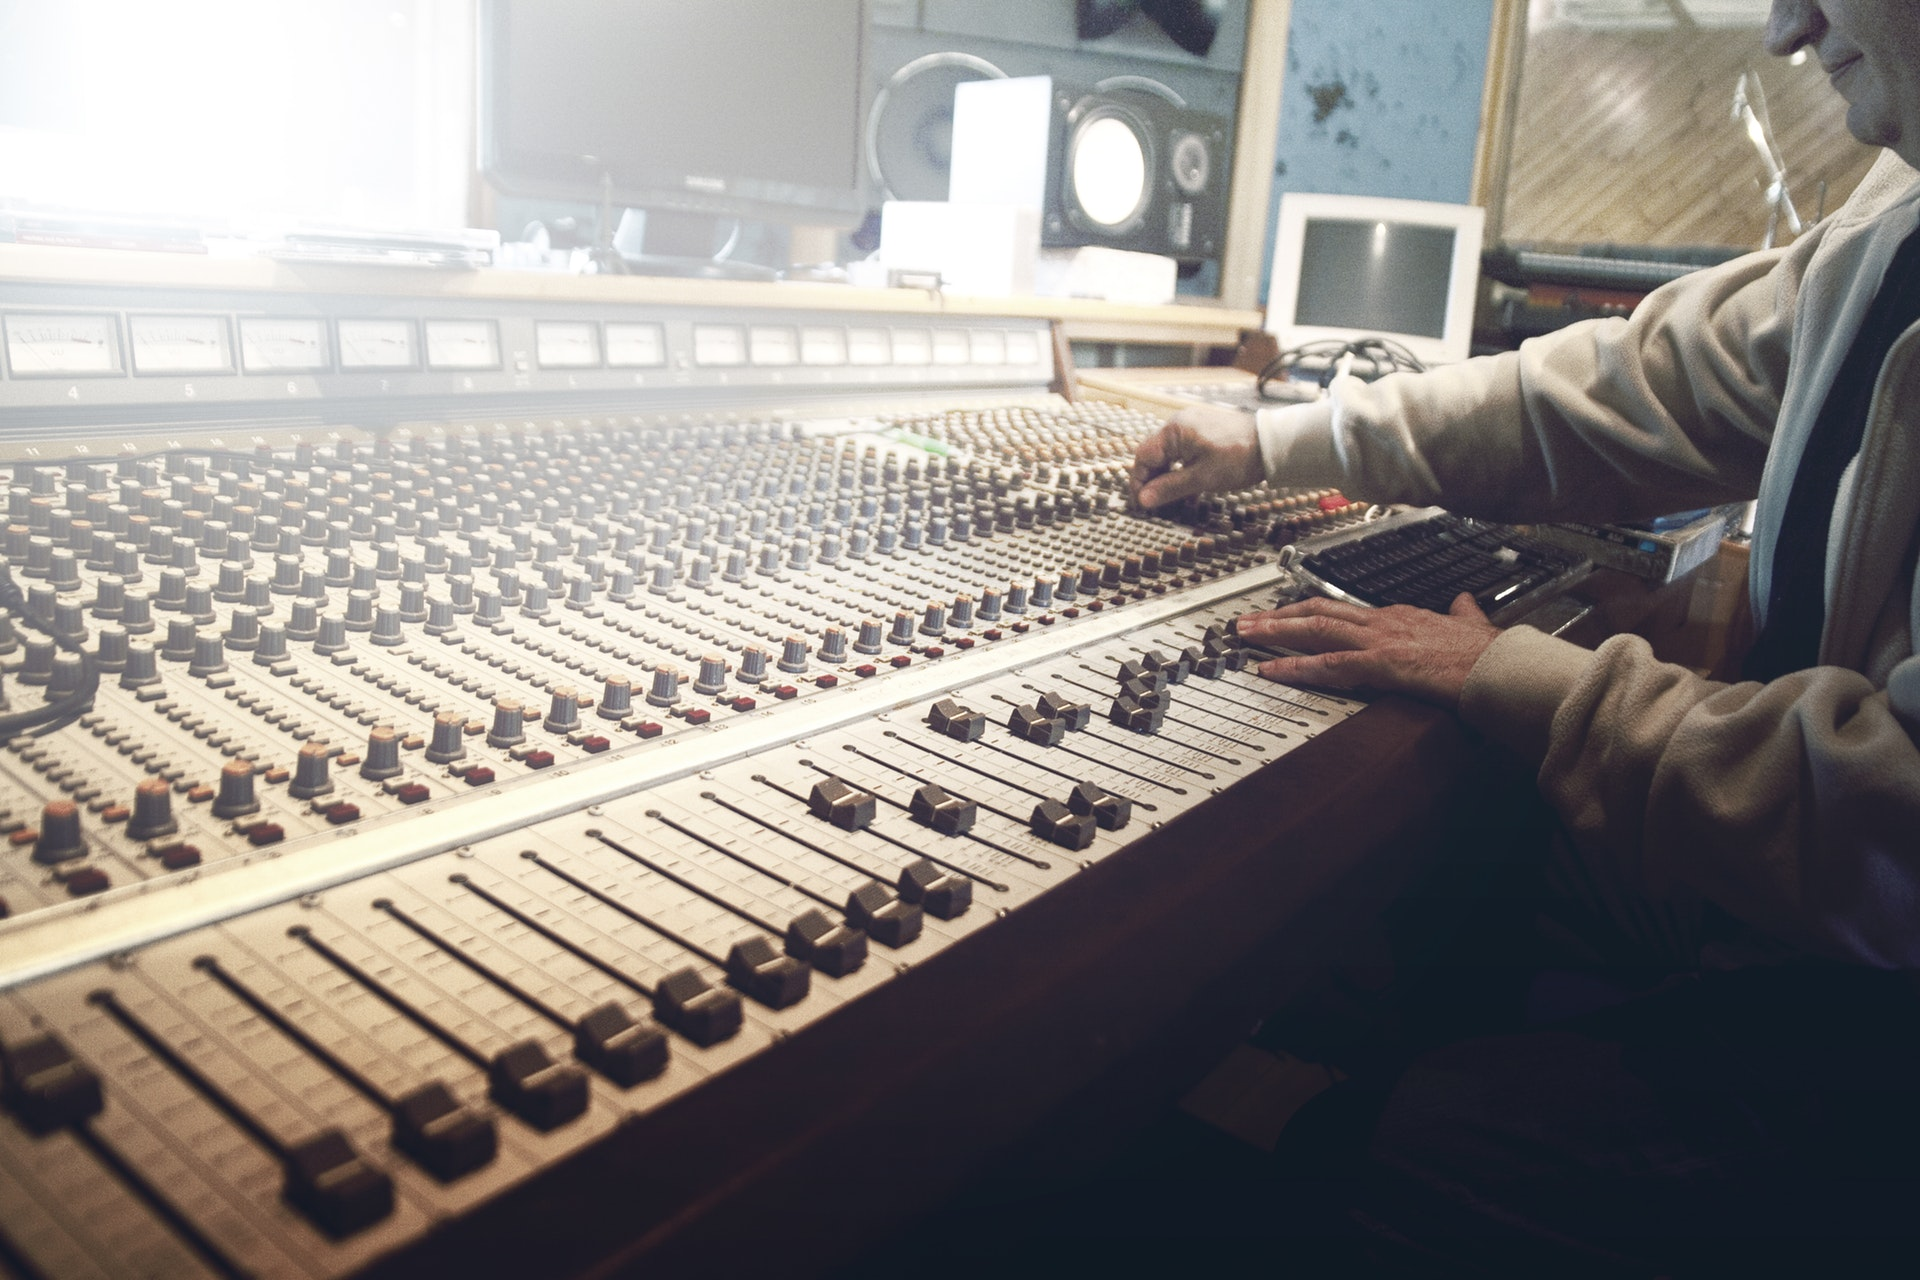 man-person-technology-music